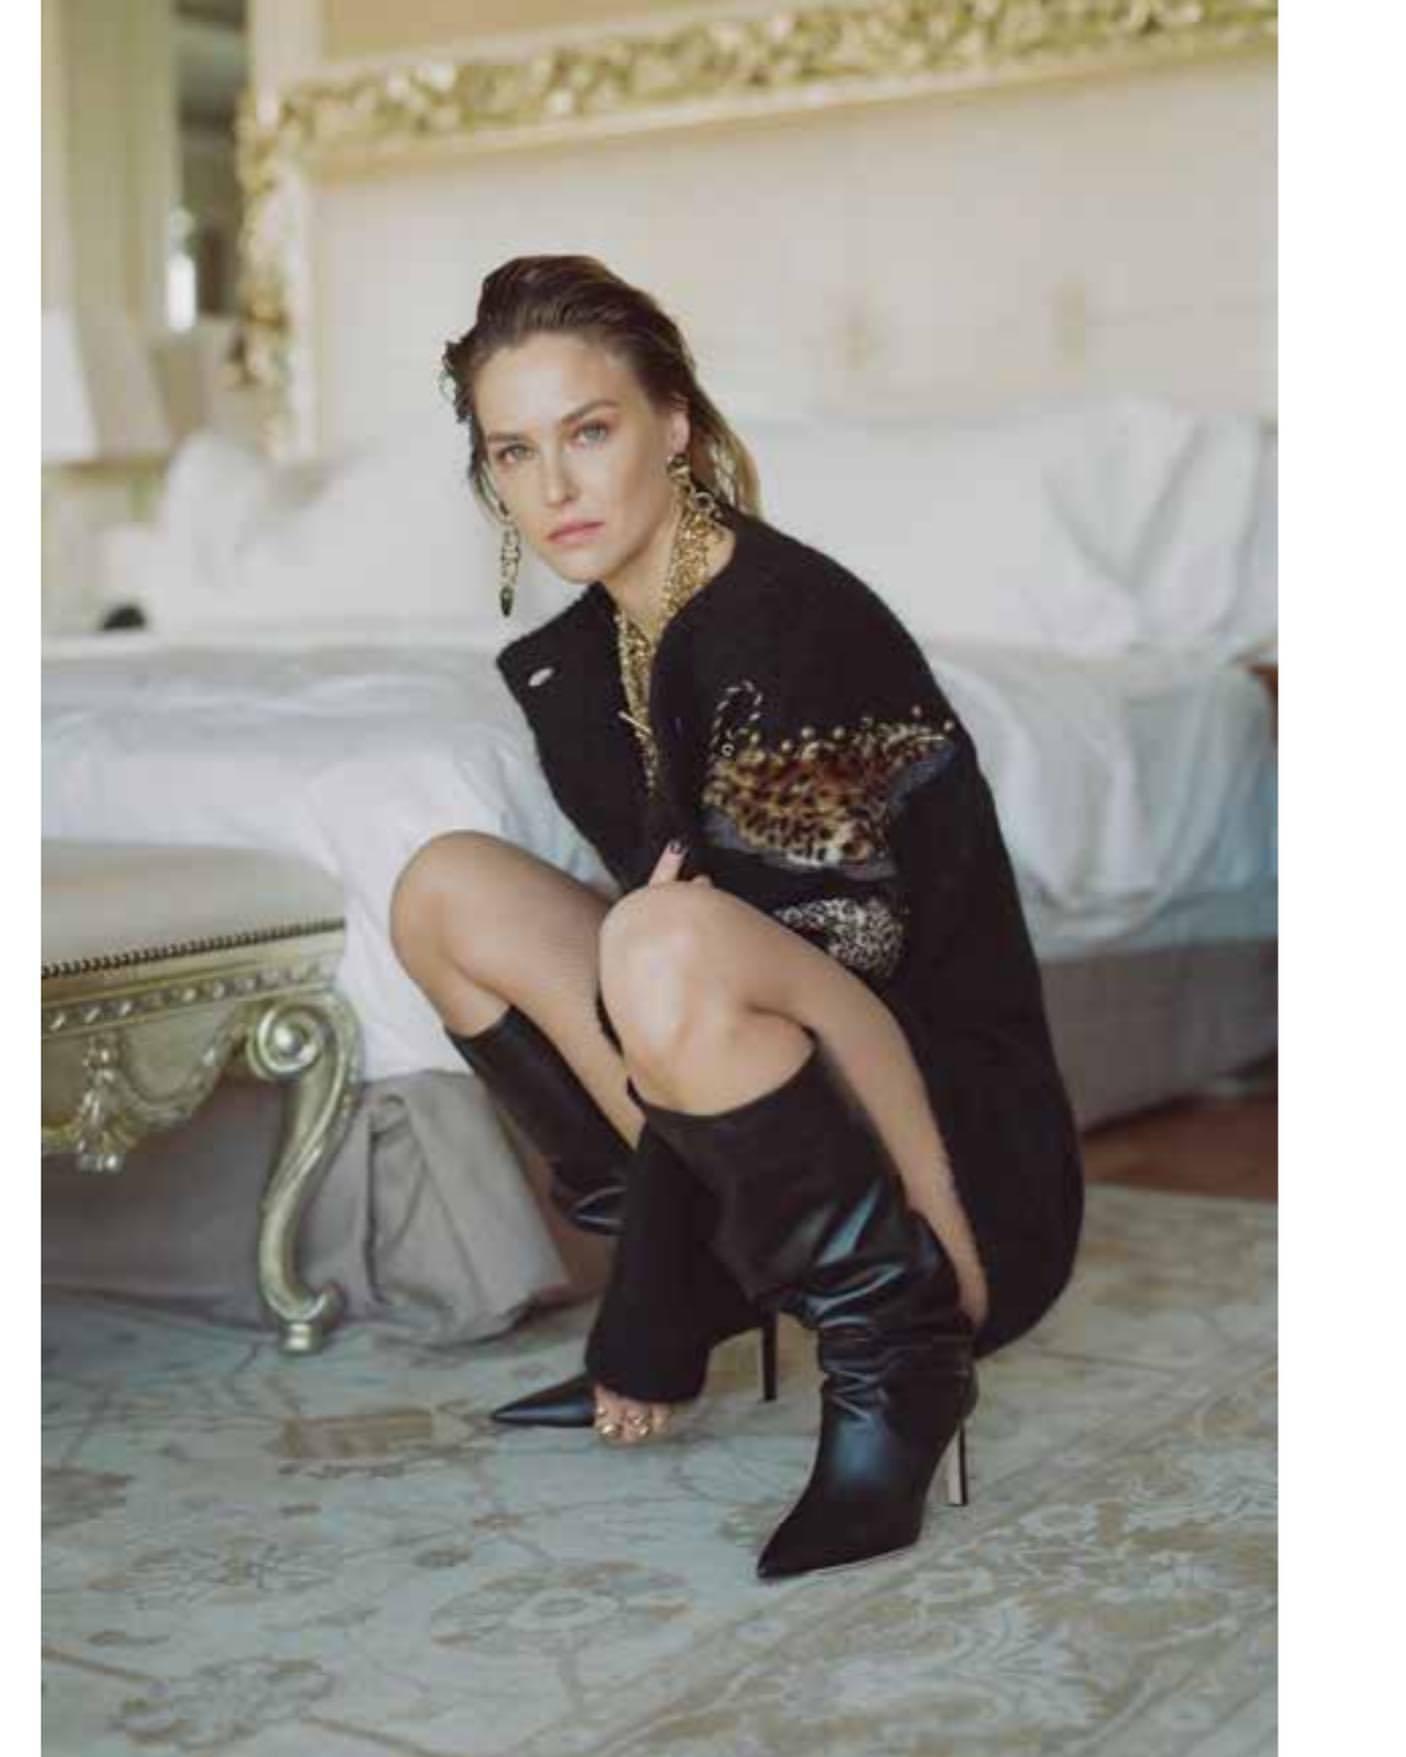 Bar Refaeli – Sexy Legs In Photoshoot For Dodo Bar Or Clothing Line 0002